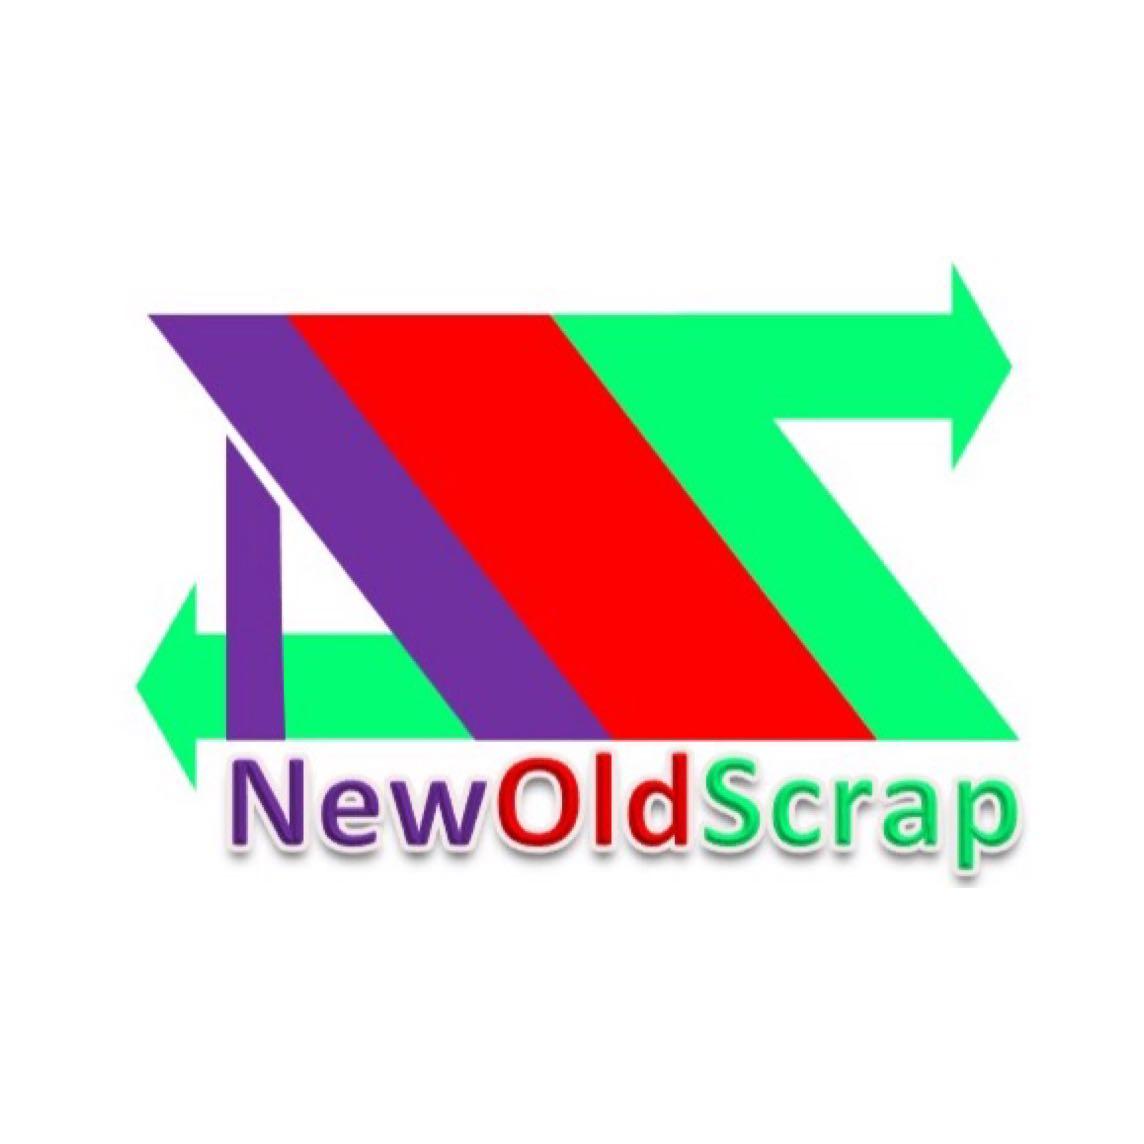 nos.newoldscrap